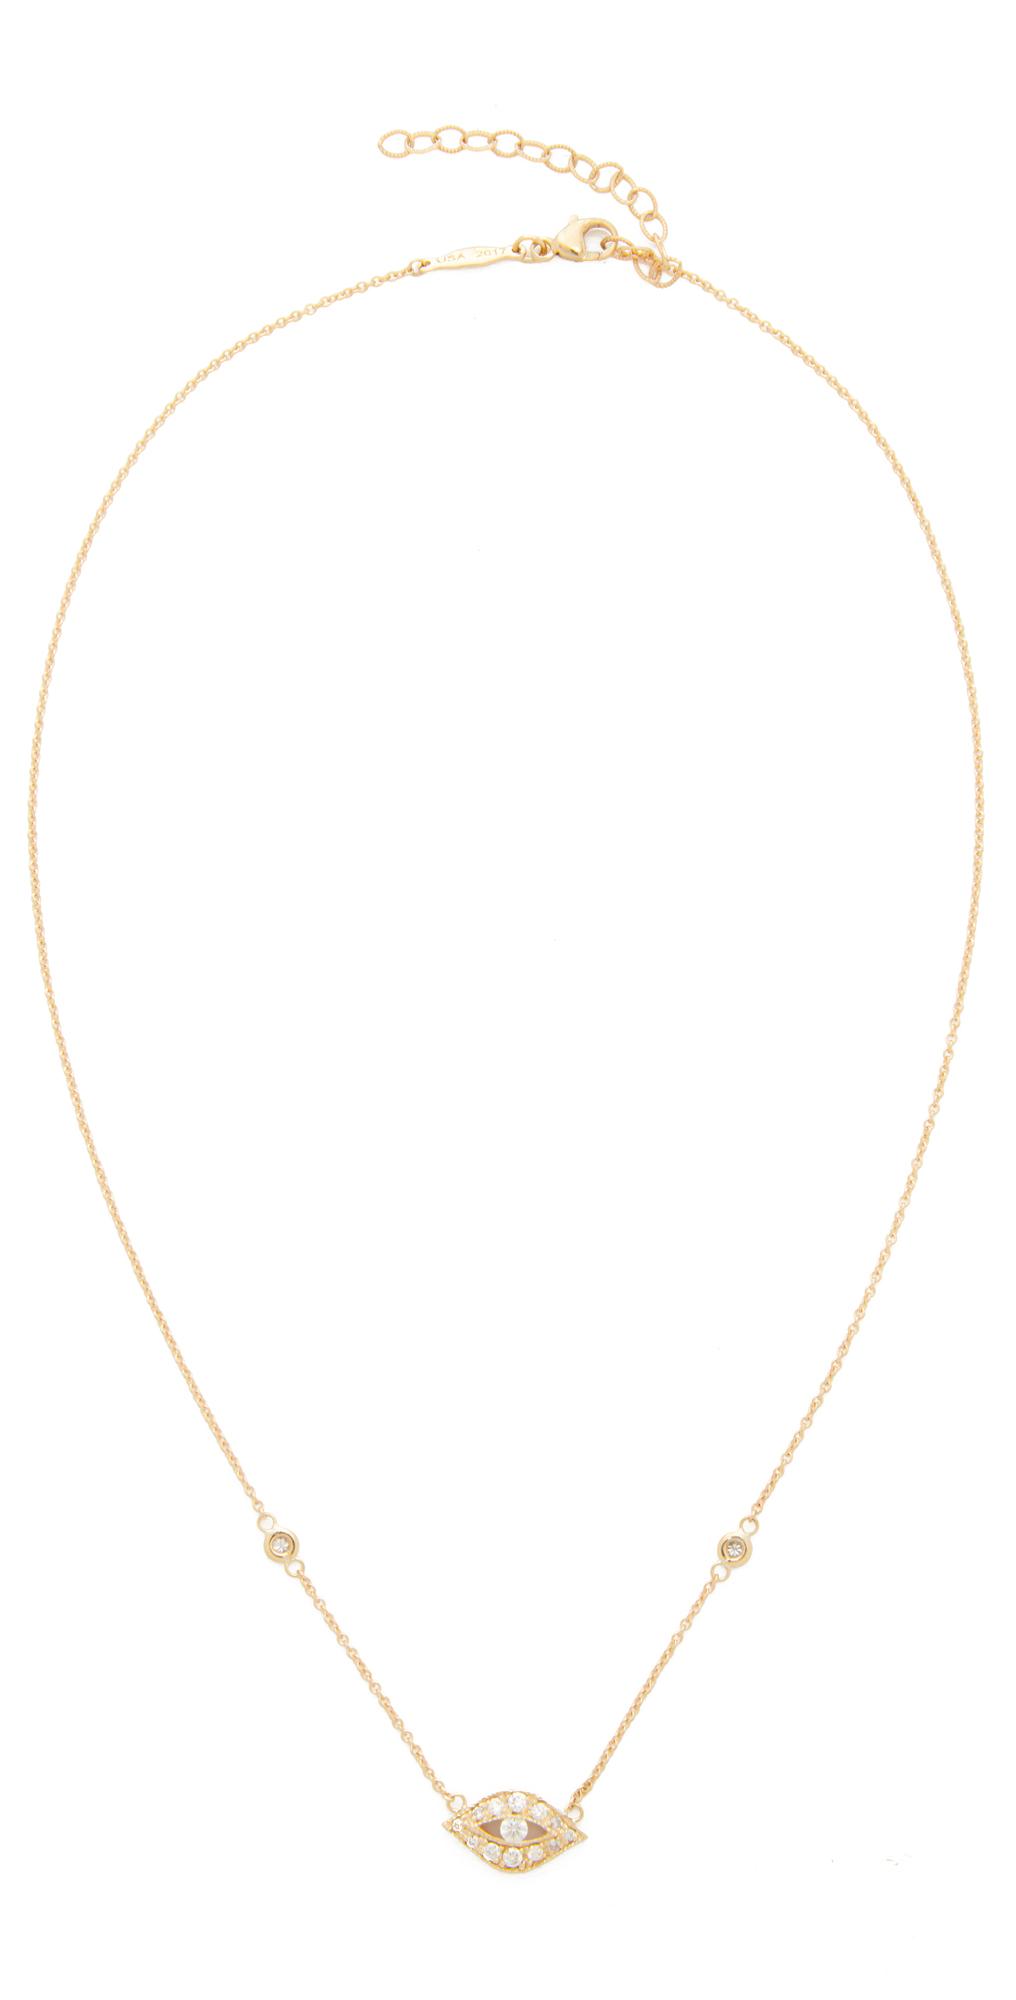 Jacquie Aiche Diamond Eye Pendant Necklace